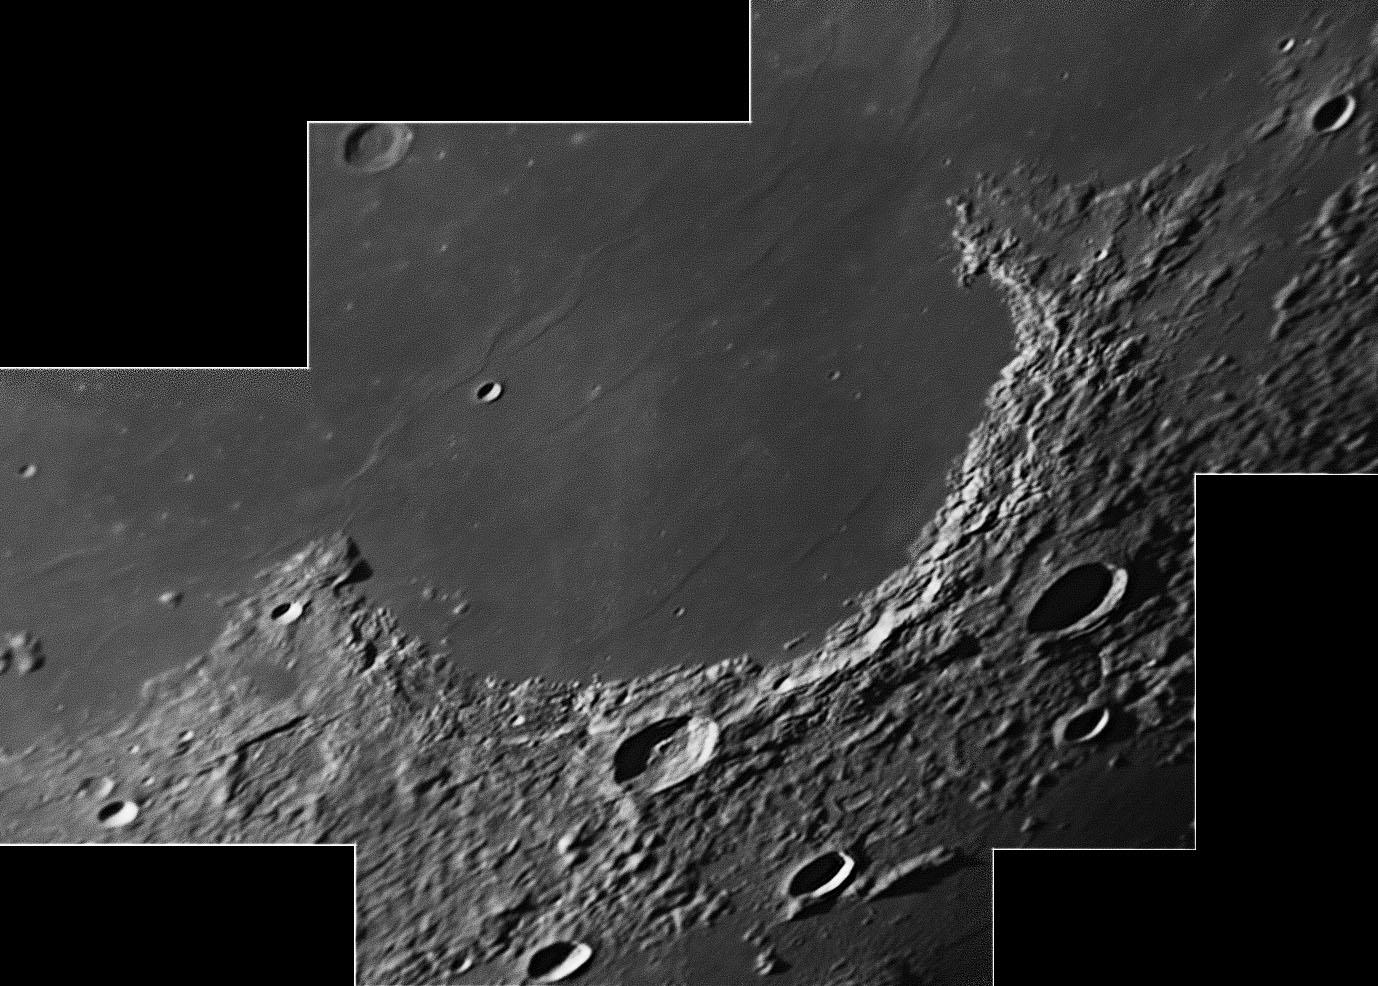 Moon200904065setc8t